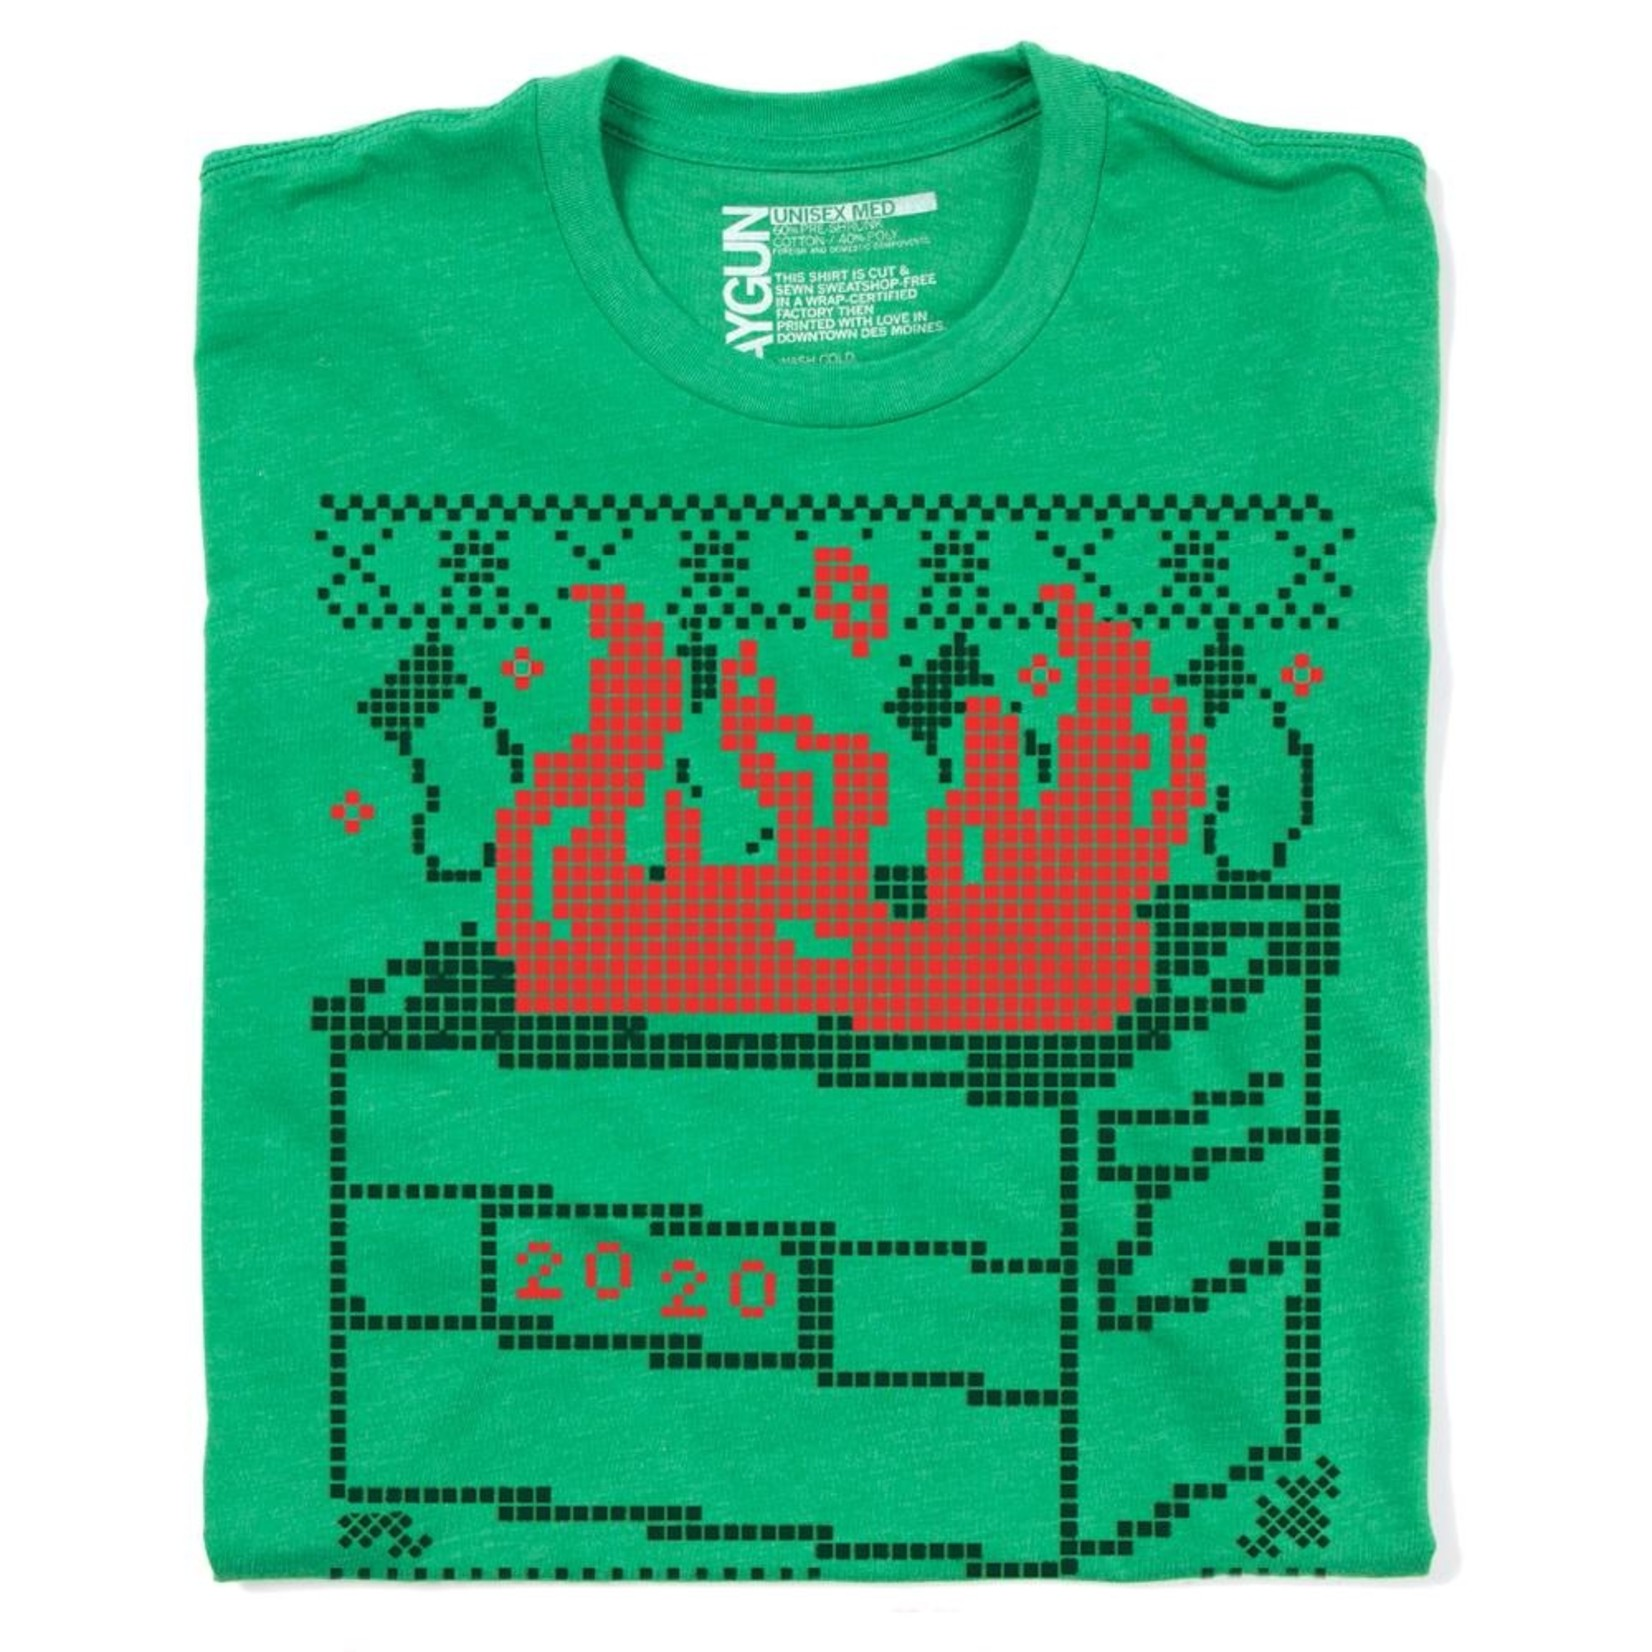 Warm Wishes 2020 Dumpster Fire Unisex Tee